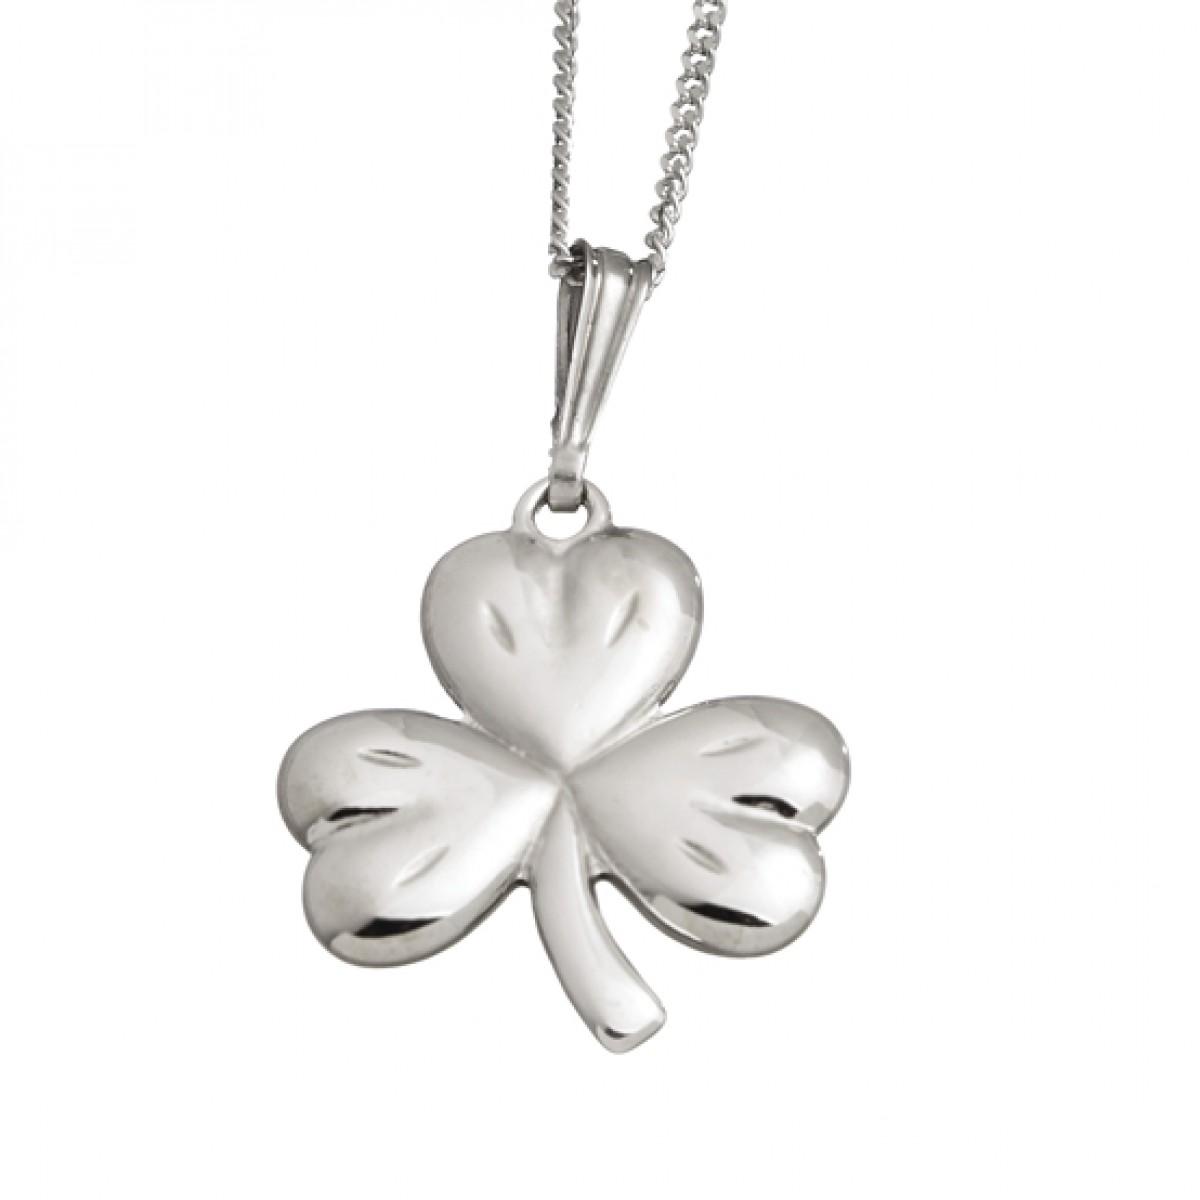 Small shamrock pendant pixie treasures celtic shoppe small shamrock pendant audiocablefo